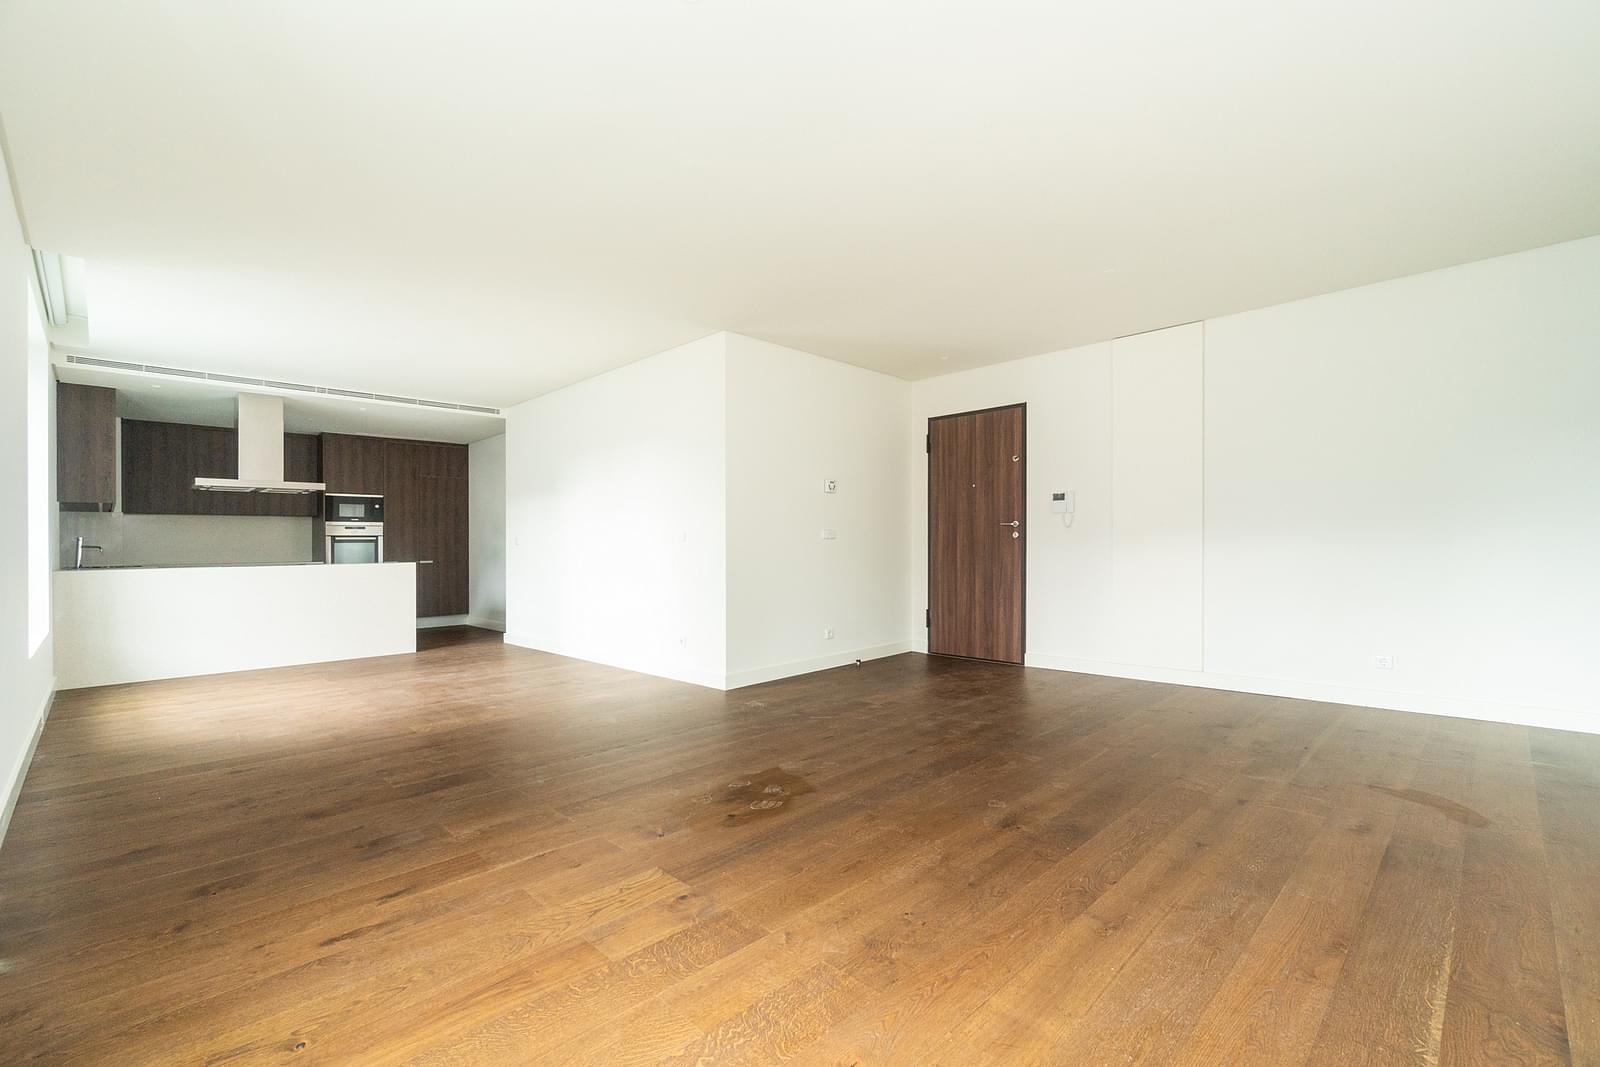 pf18694-apartamento-t3-lisboa-c51e9db0-2ba4-4f3c-a5f4-ff5831efcfa4